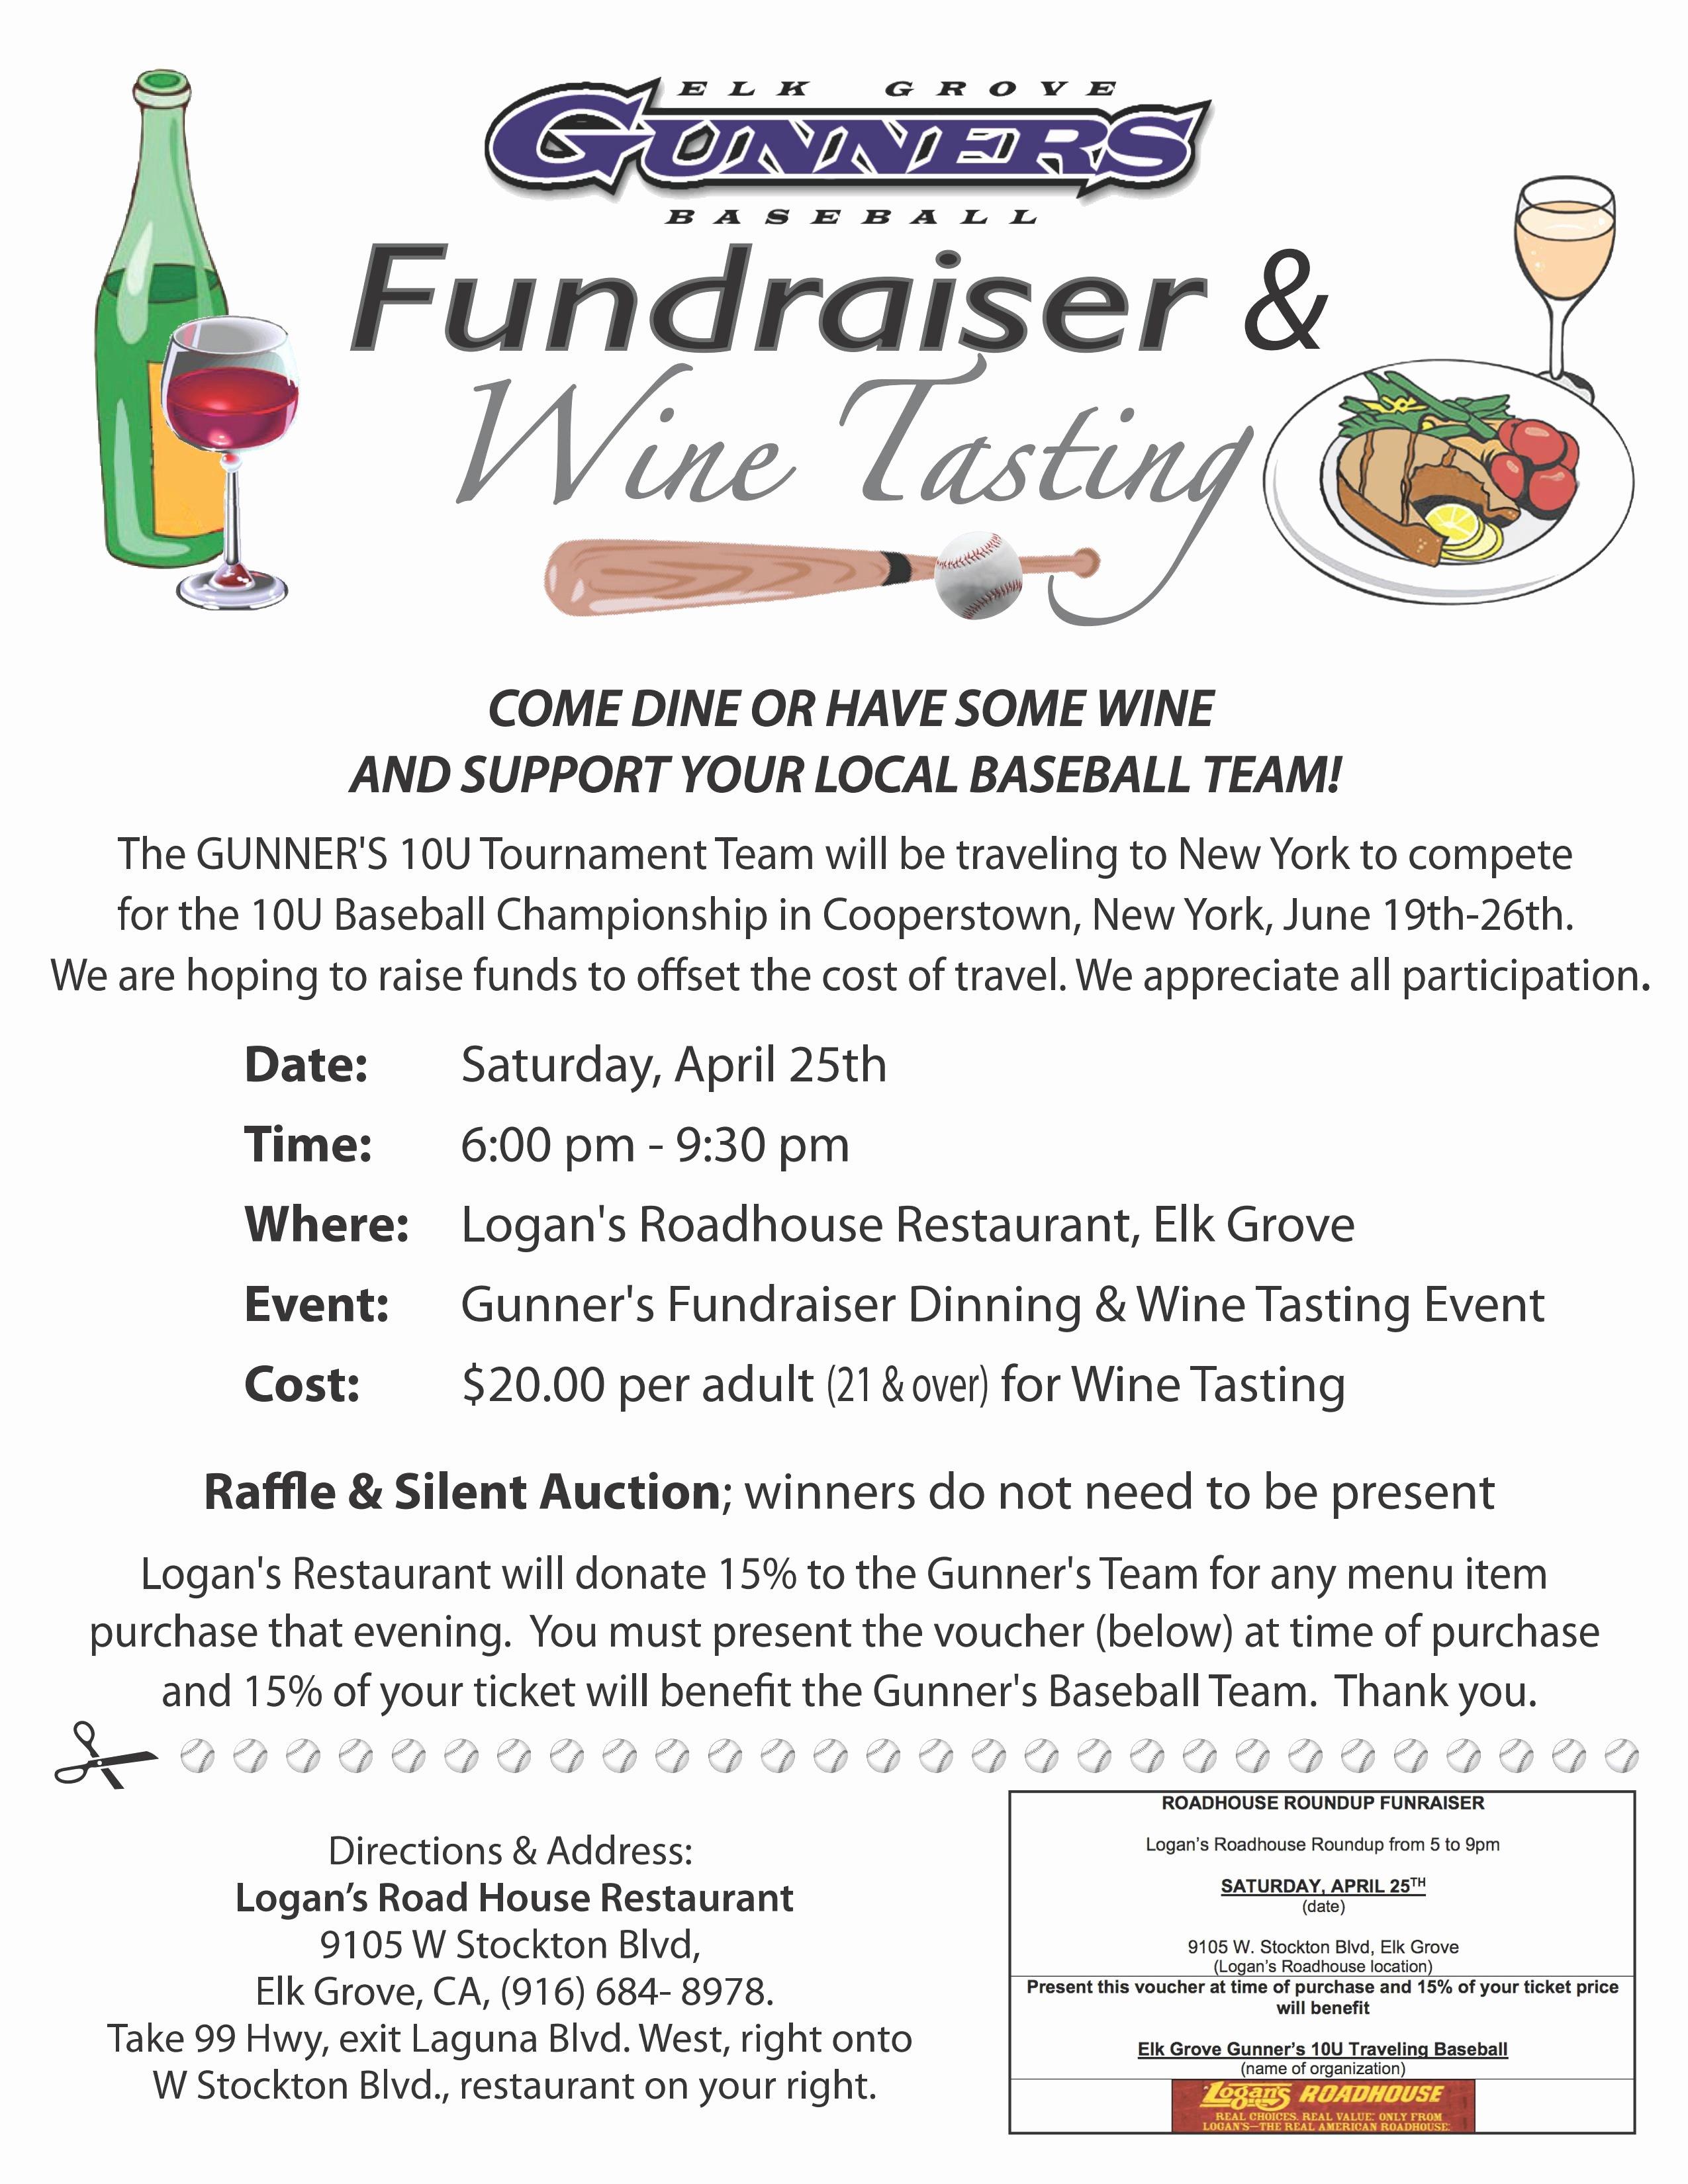 Fundraiser Flyer Template Free Beautiful Baseball Fundraiser Flyer Template Yourweek Eca25e